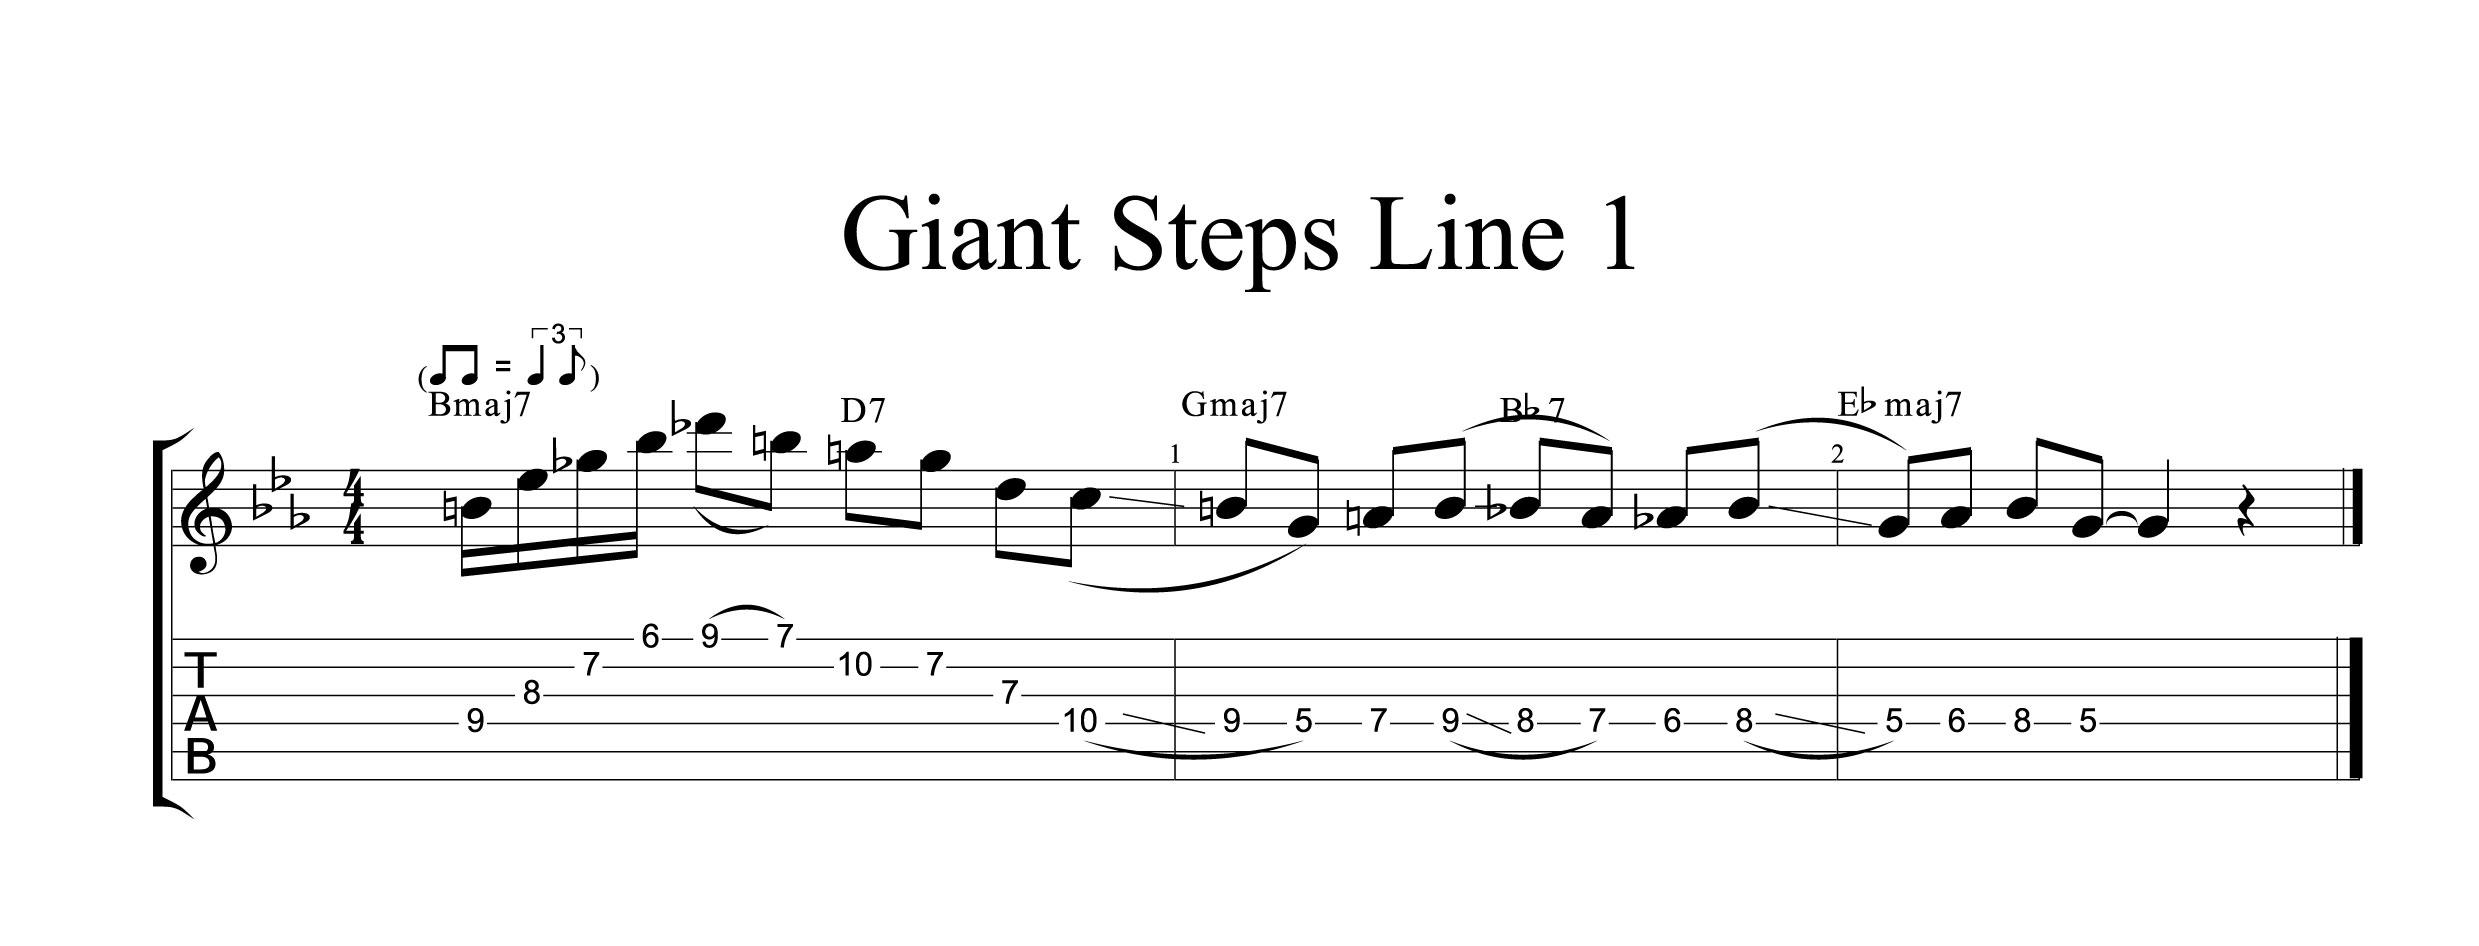 Giant Steps Line 1